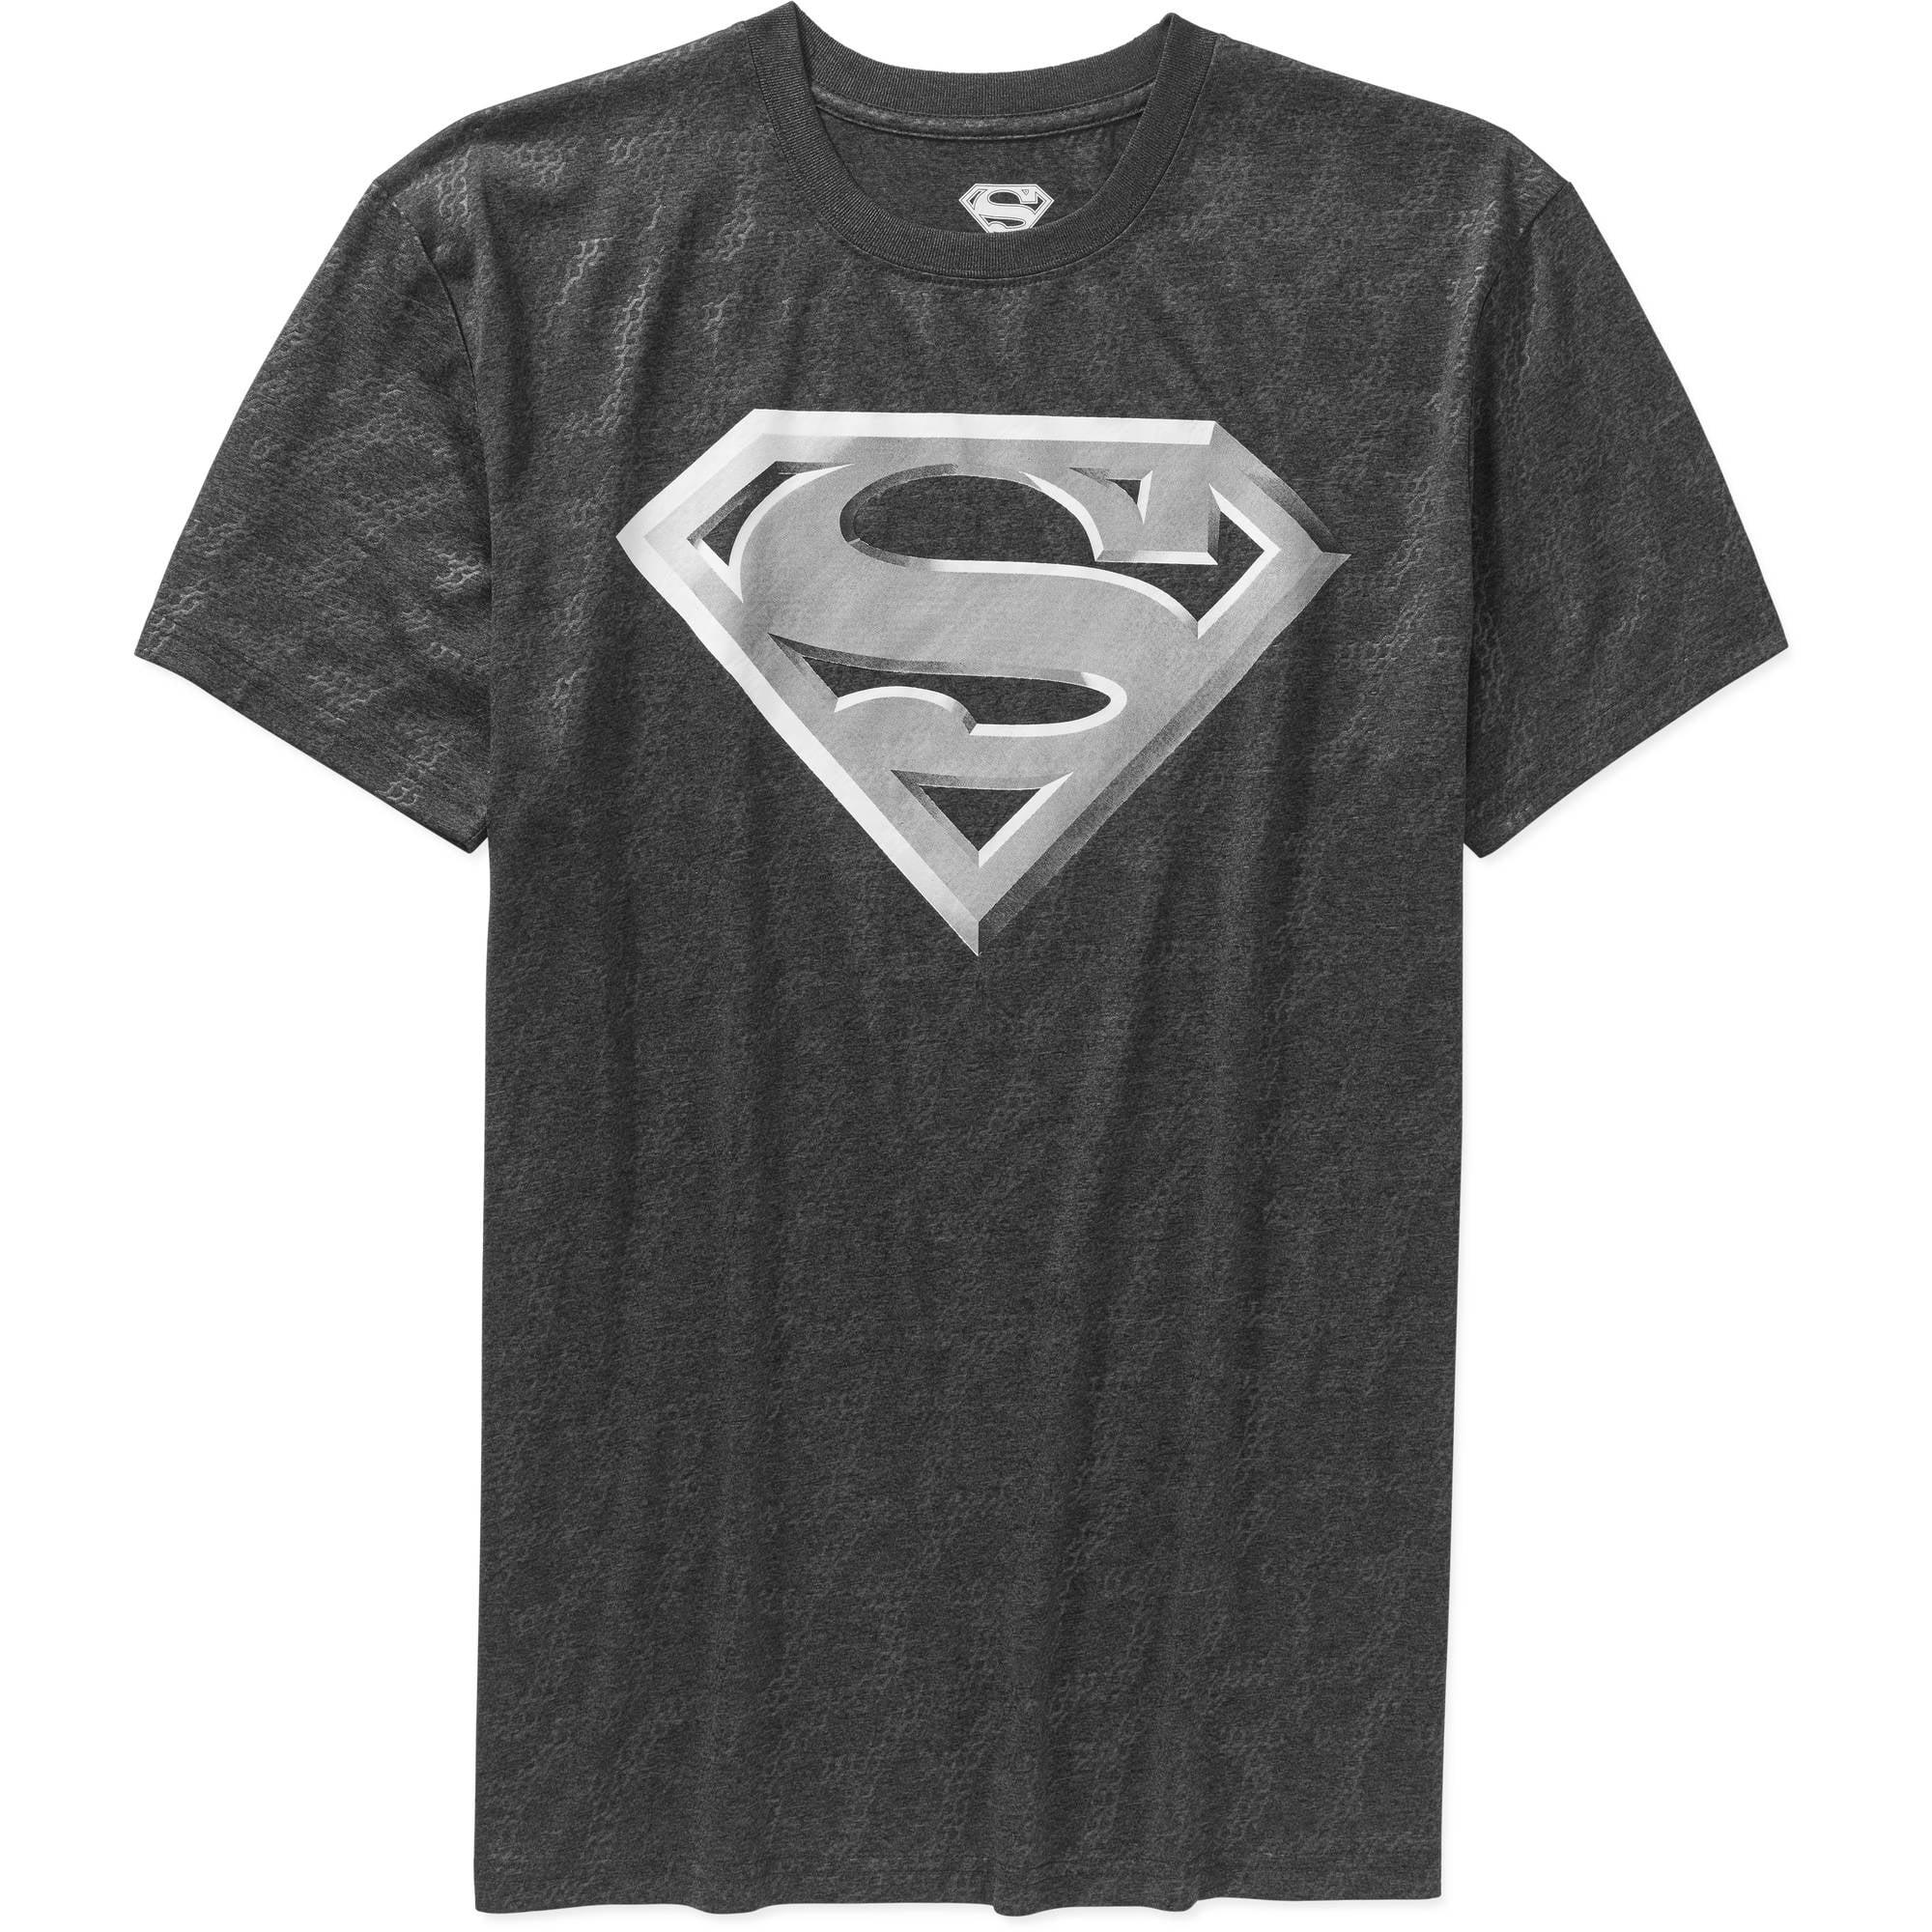 Black t shirt at walmart - Black T Shirt At Walmart 5